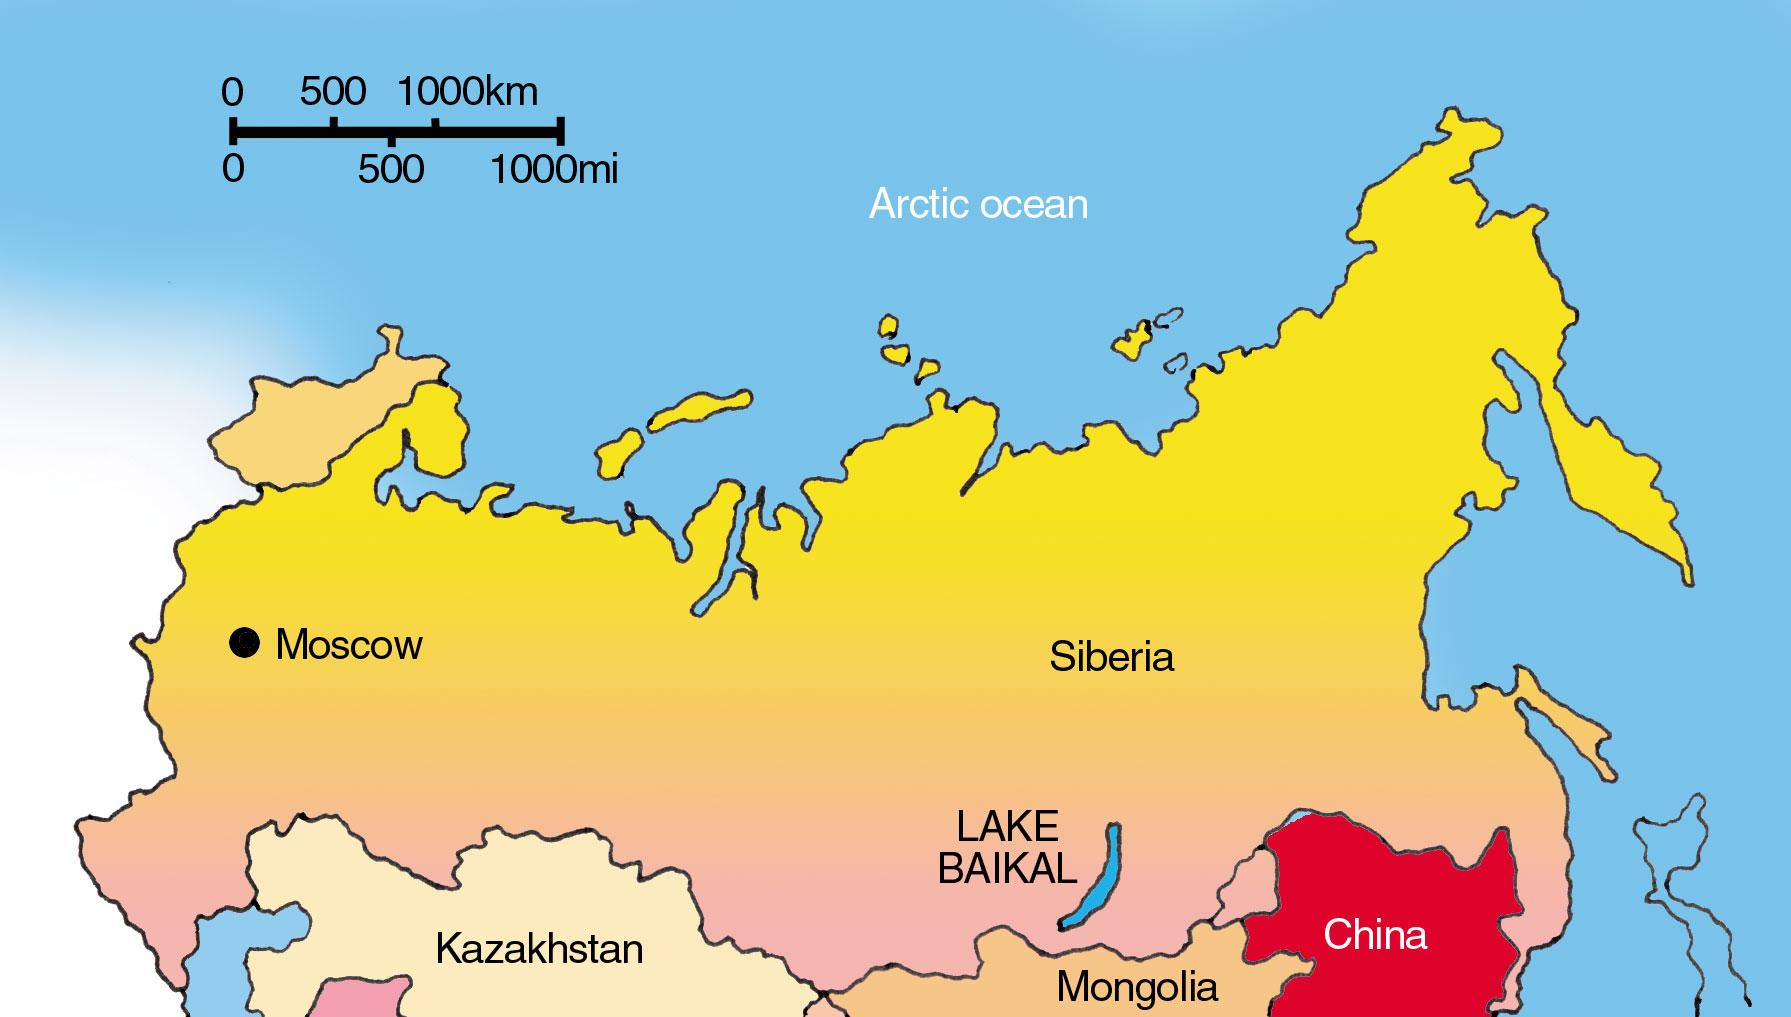 env-baikal-map